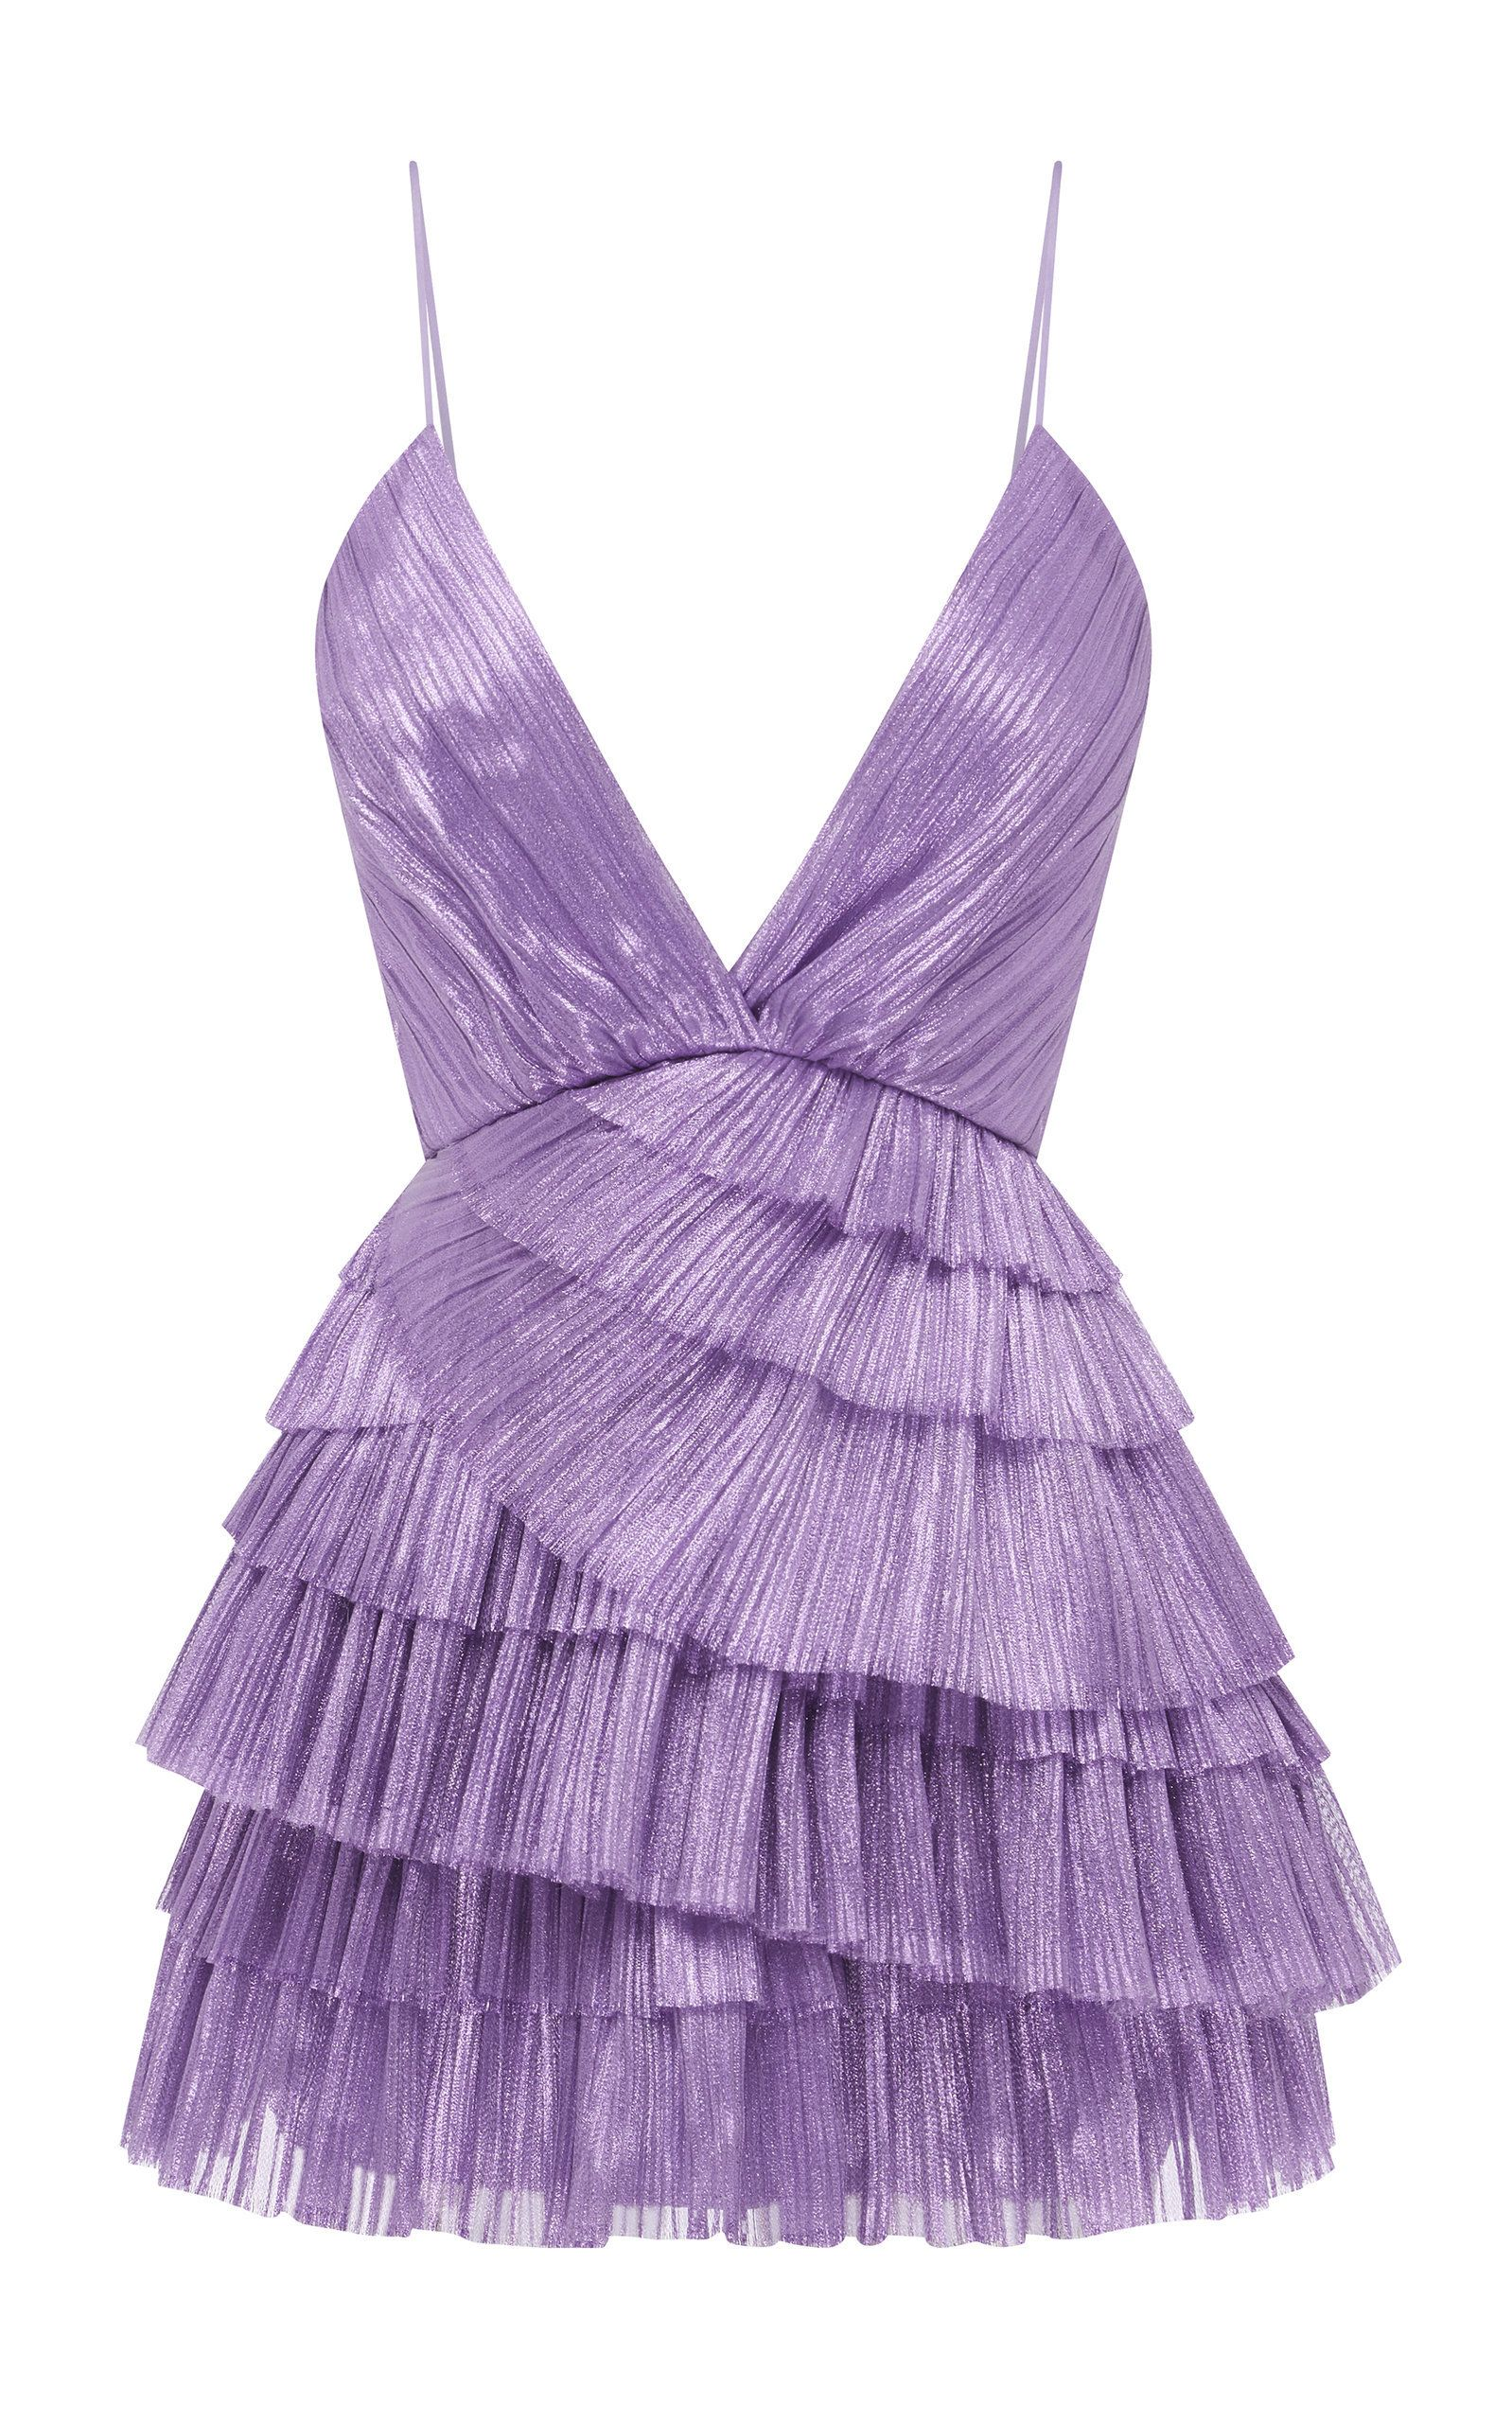 40cb5b87c08c Don't Be Shy Pleated Shell Dress in 2019 | Fashion | Dresses, Satin ...